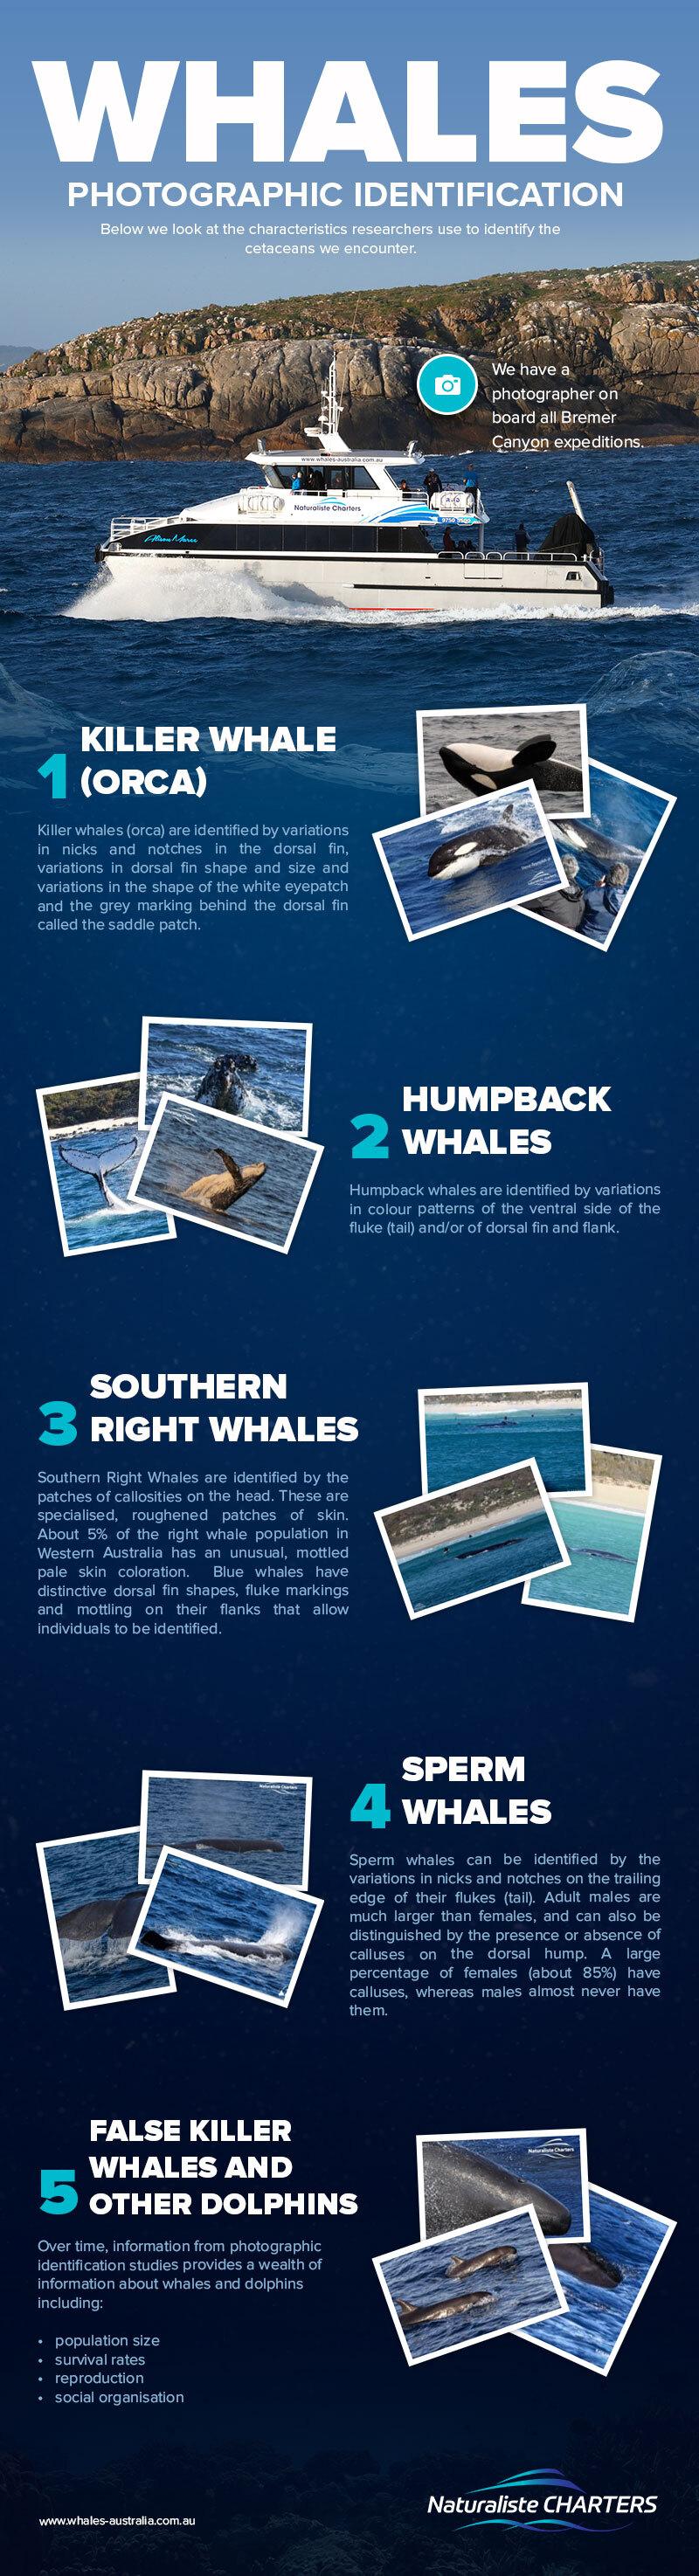 Whales Photographic Identification